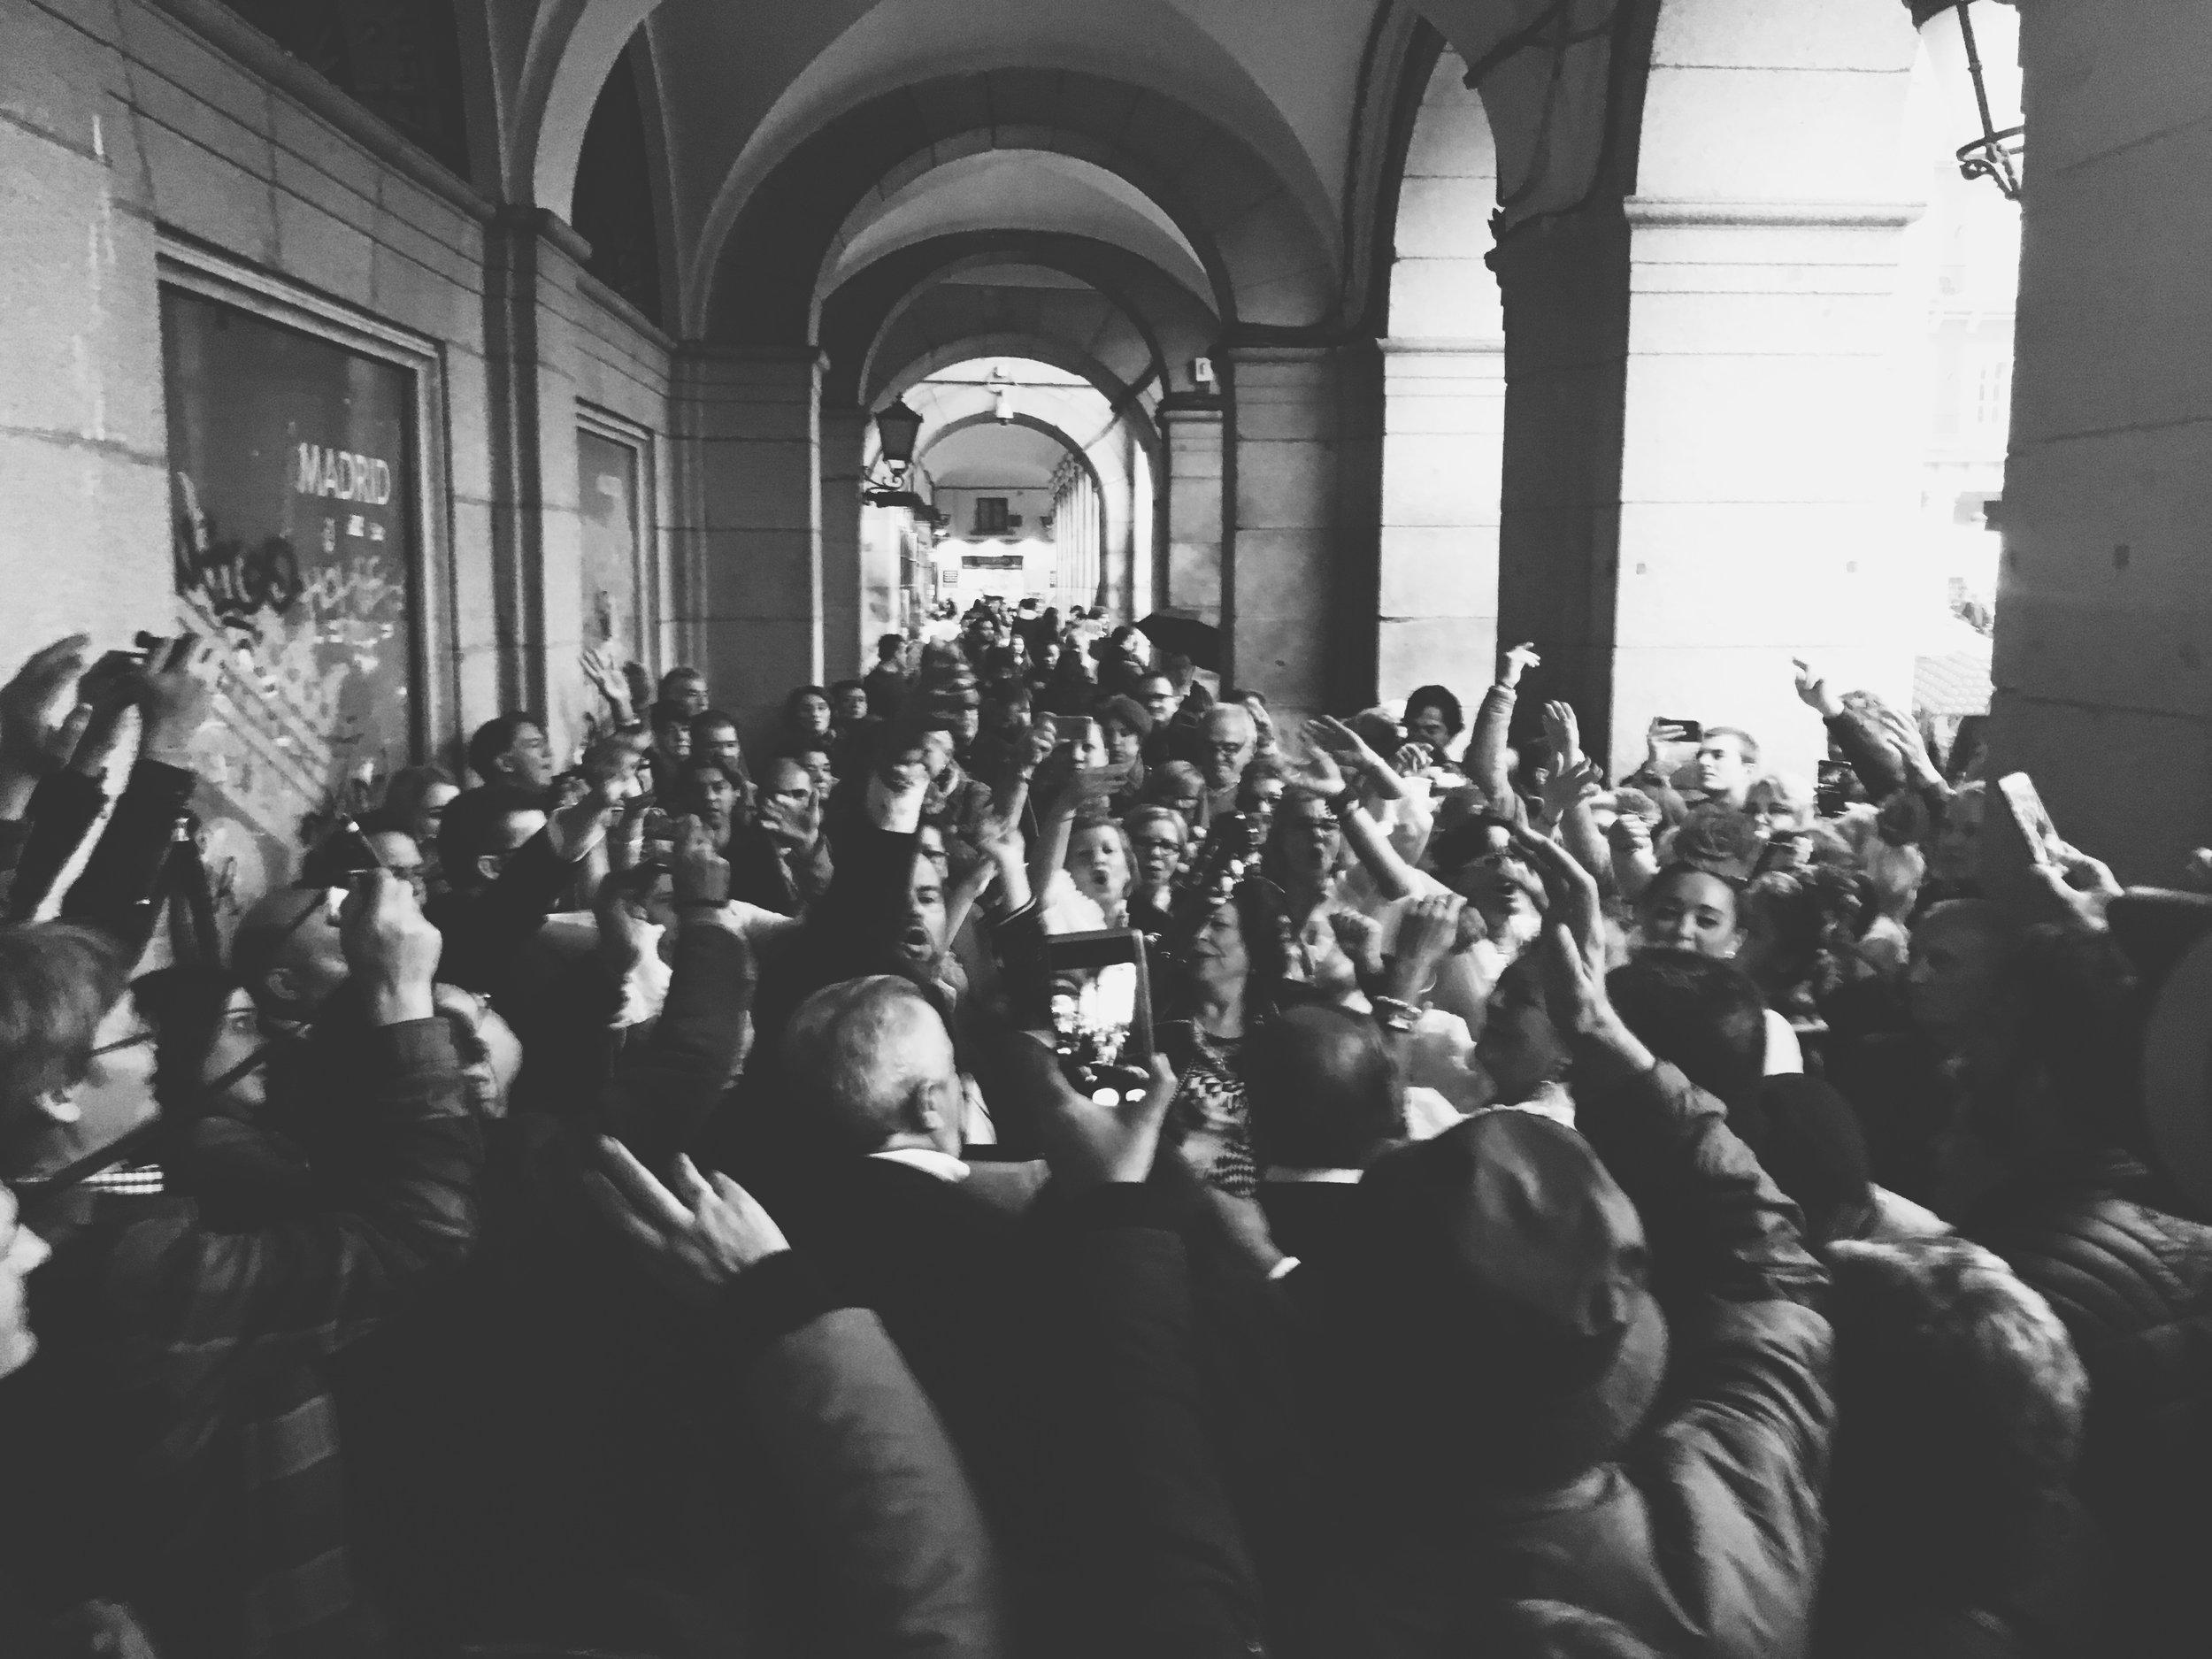 Media Frenzy - Madrid, Spain 2016